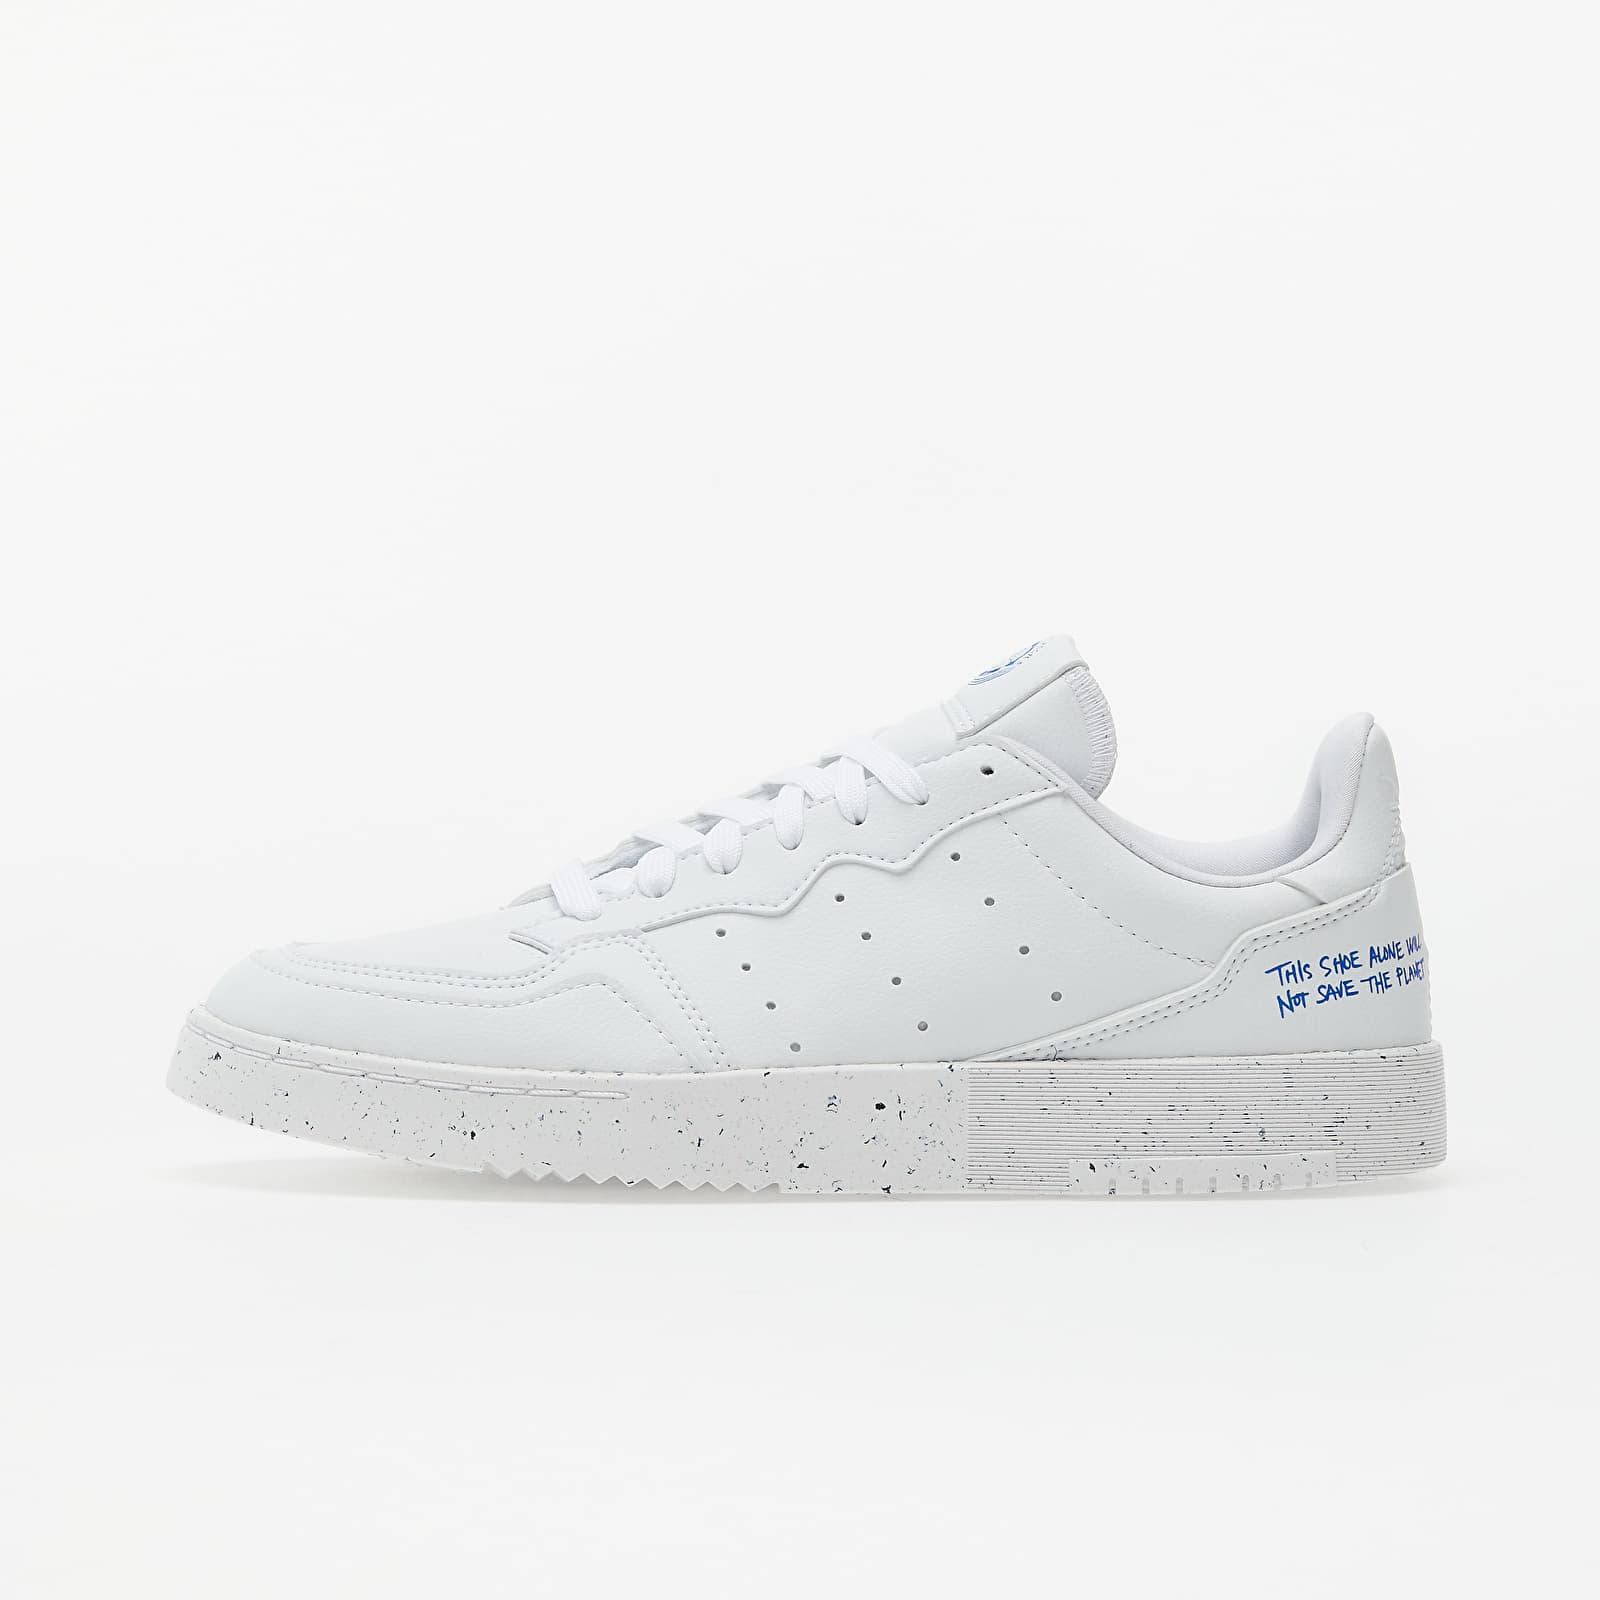 Pánske tenisky a topánky adidas Supercourt Clean Classics Ftw White/ Ftw White/ Core Royal